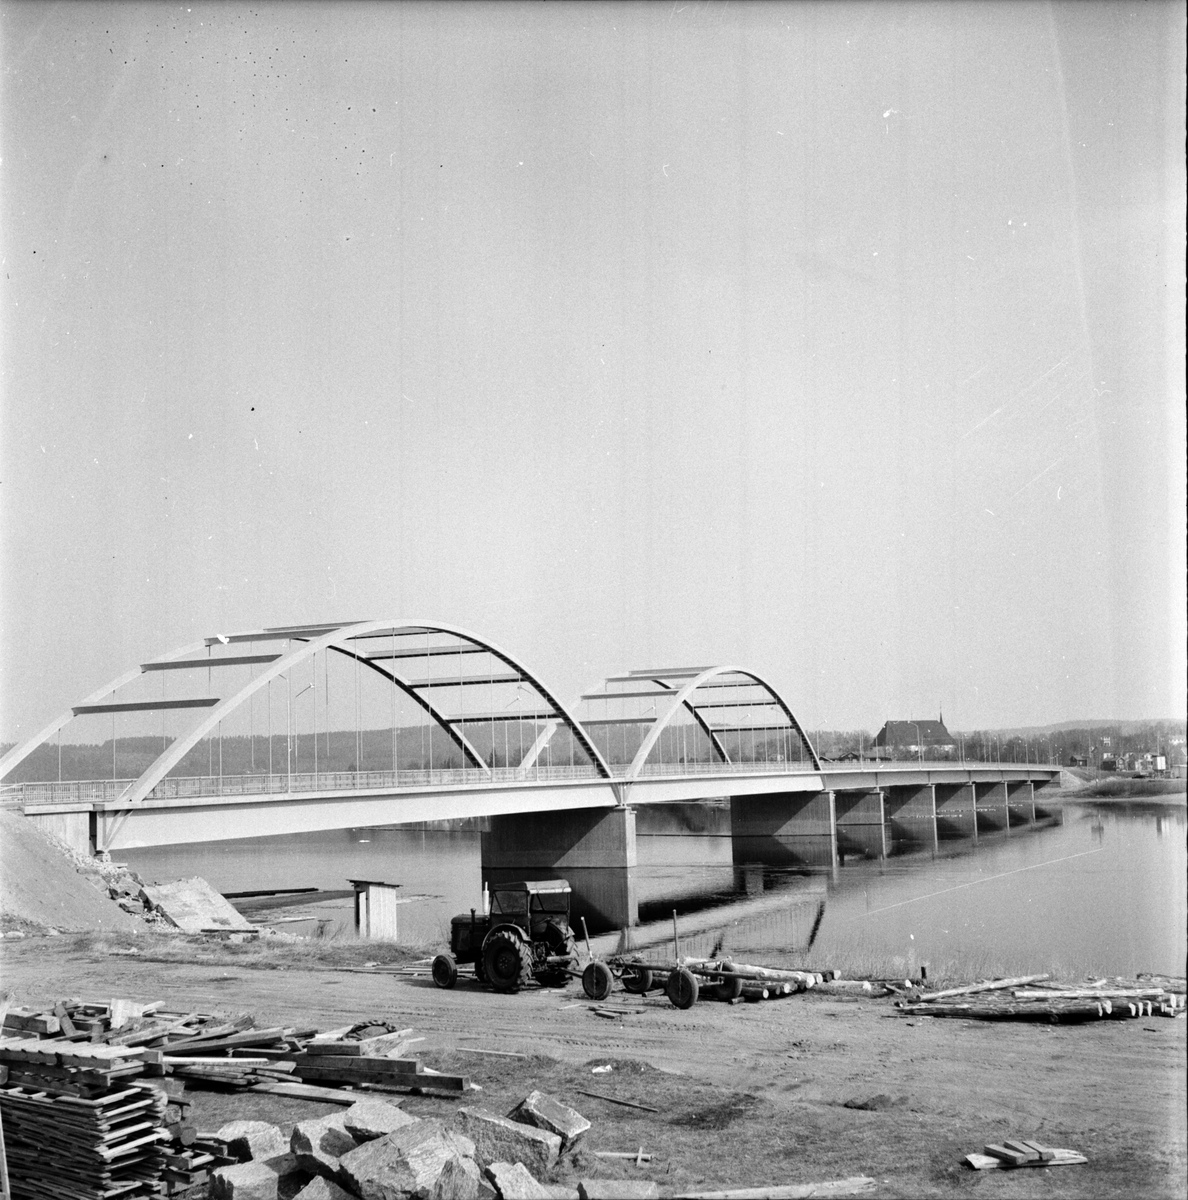 Ljusdal, Nya bron över Ljusnan, 22 April 1965